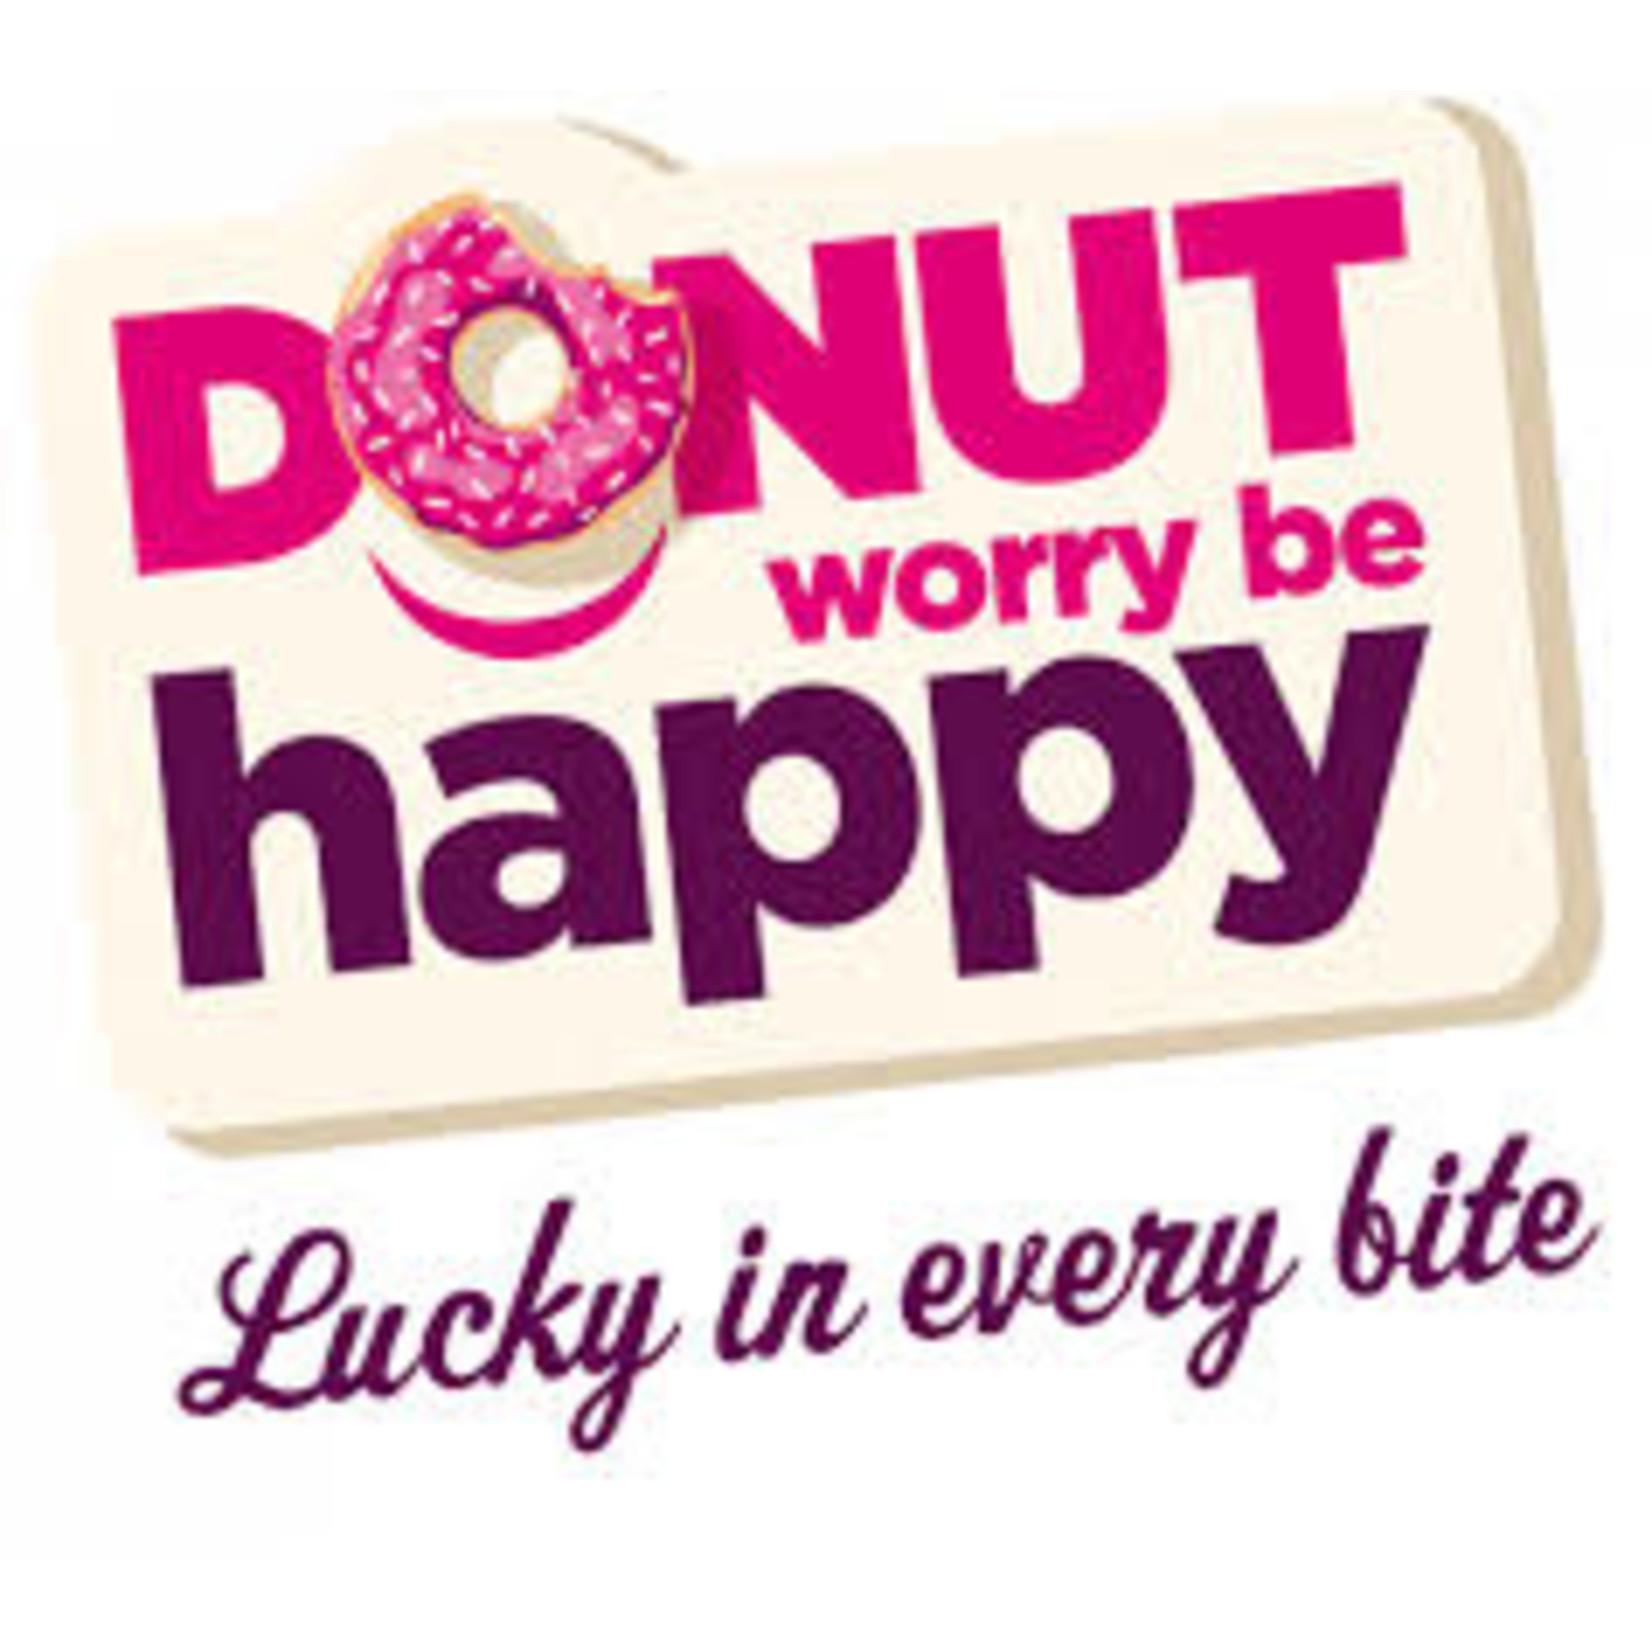 donut worry be happy DONUT KARAMELVULLING MET CHOCOLADELIJNEN